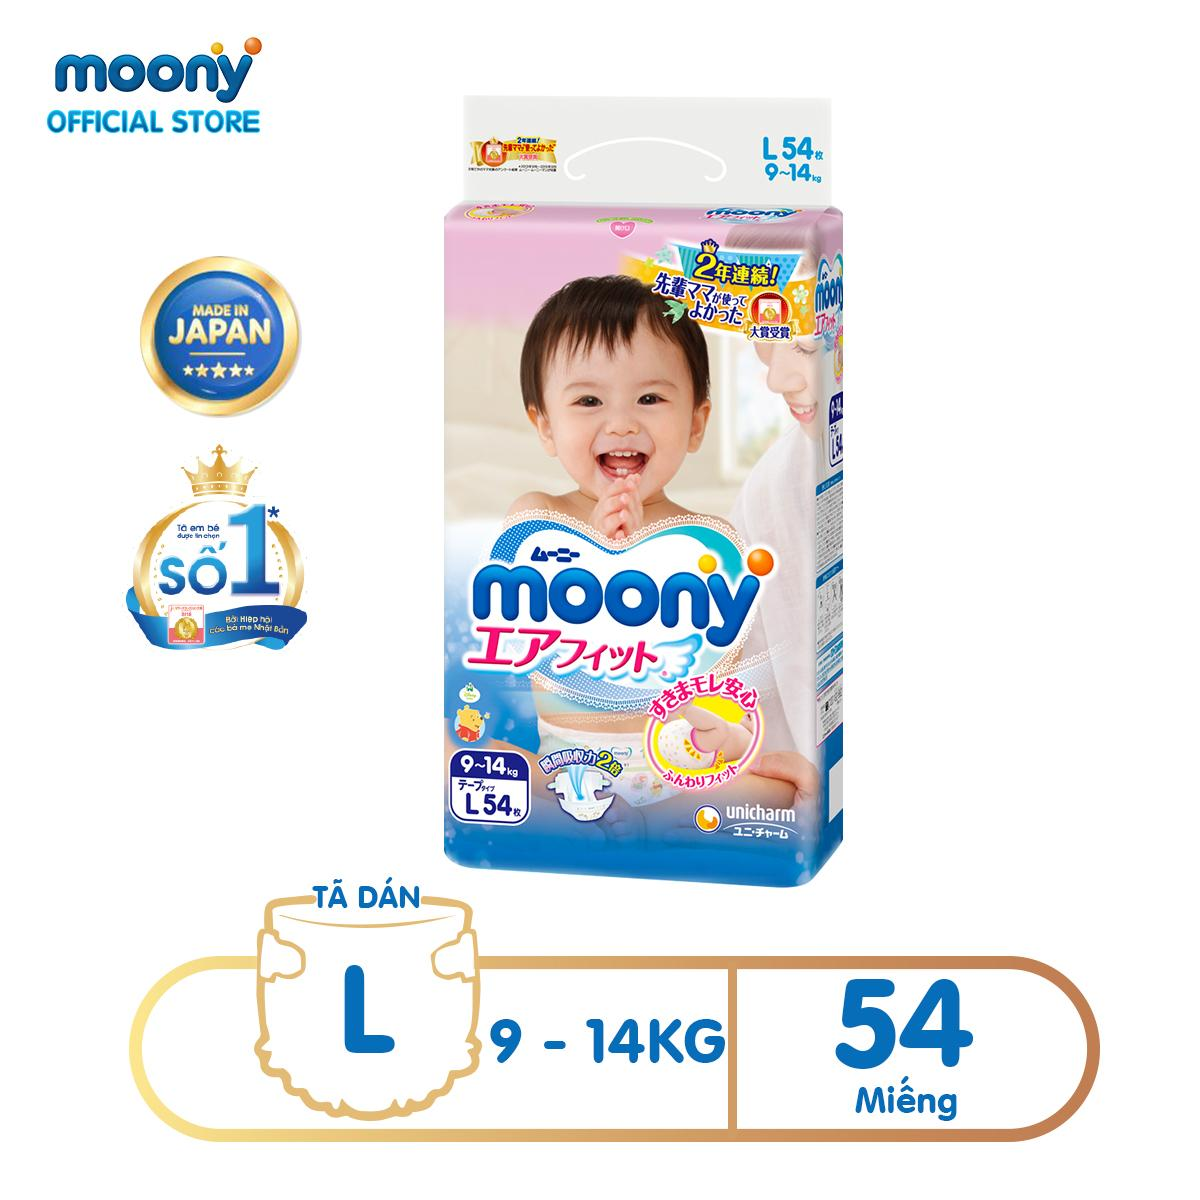 Tã dán Moony L - 54 miếng (9 - 14kg)...